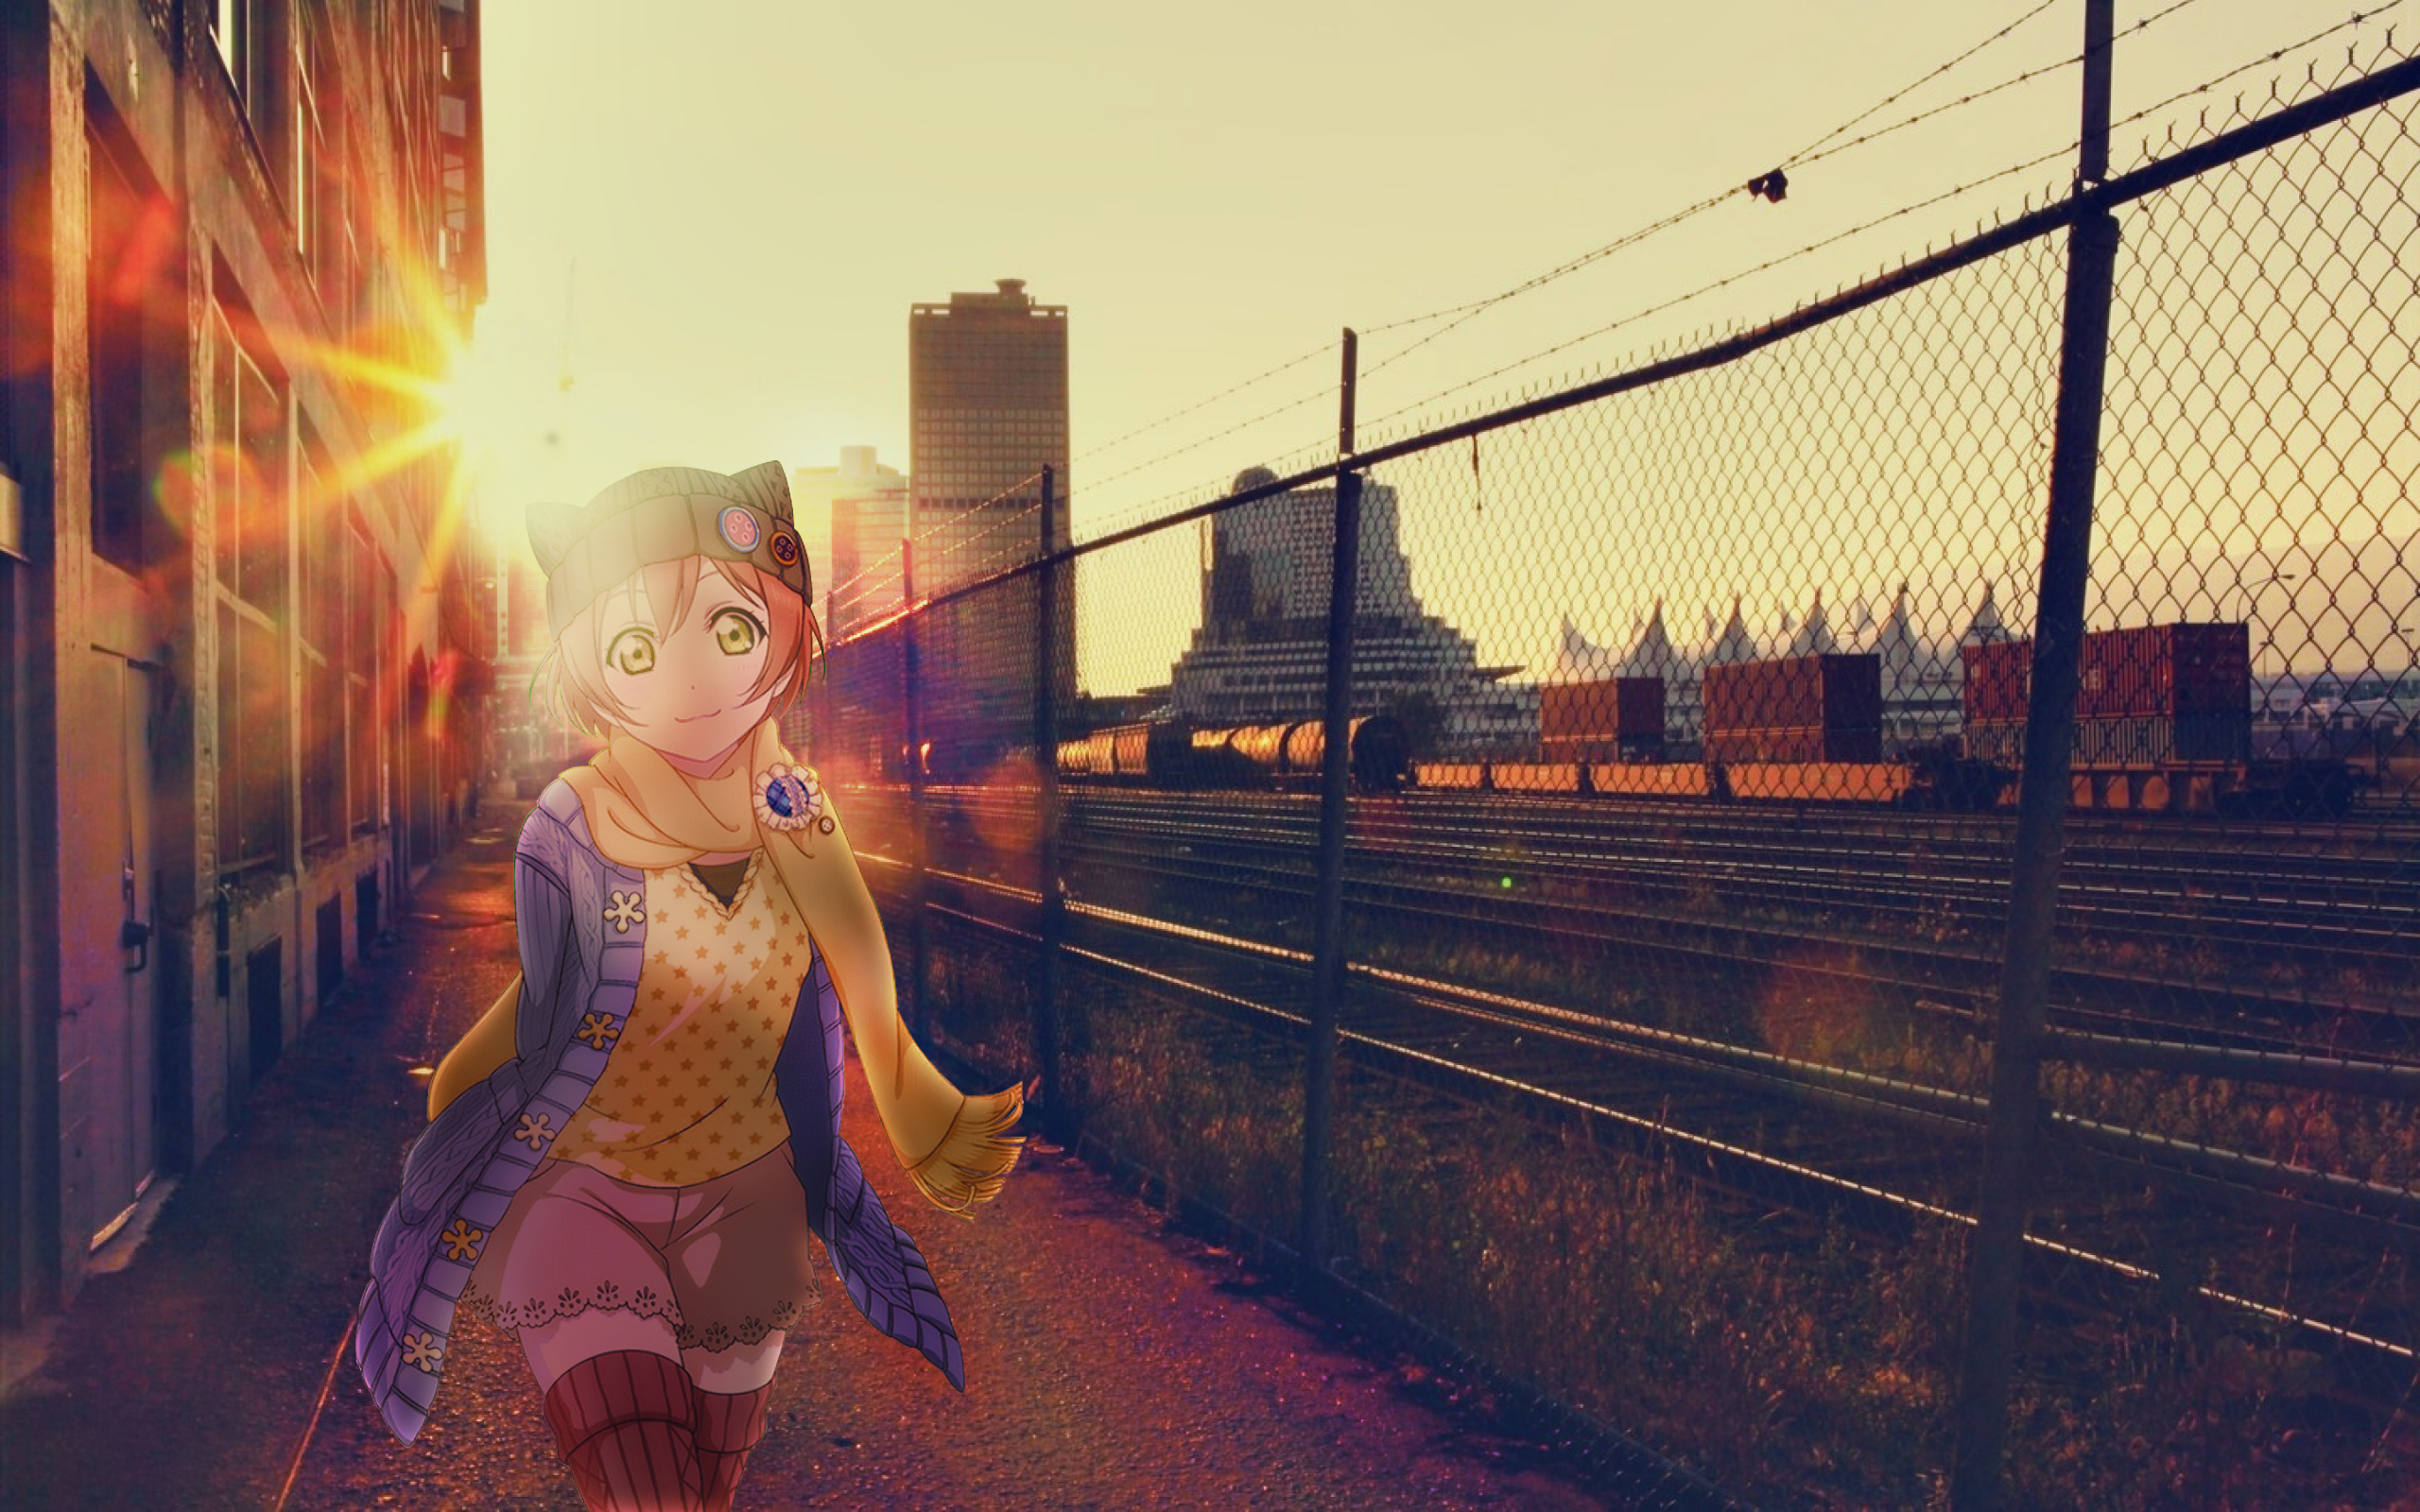 Anime 2560x1600 anime girls cityscape Love Live! Hoshizora Rin